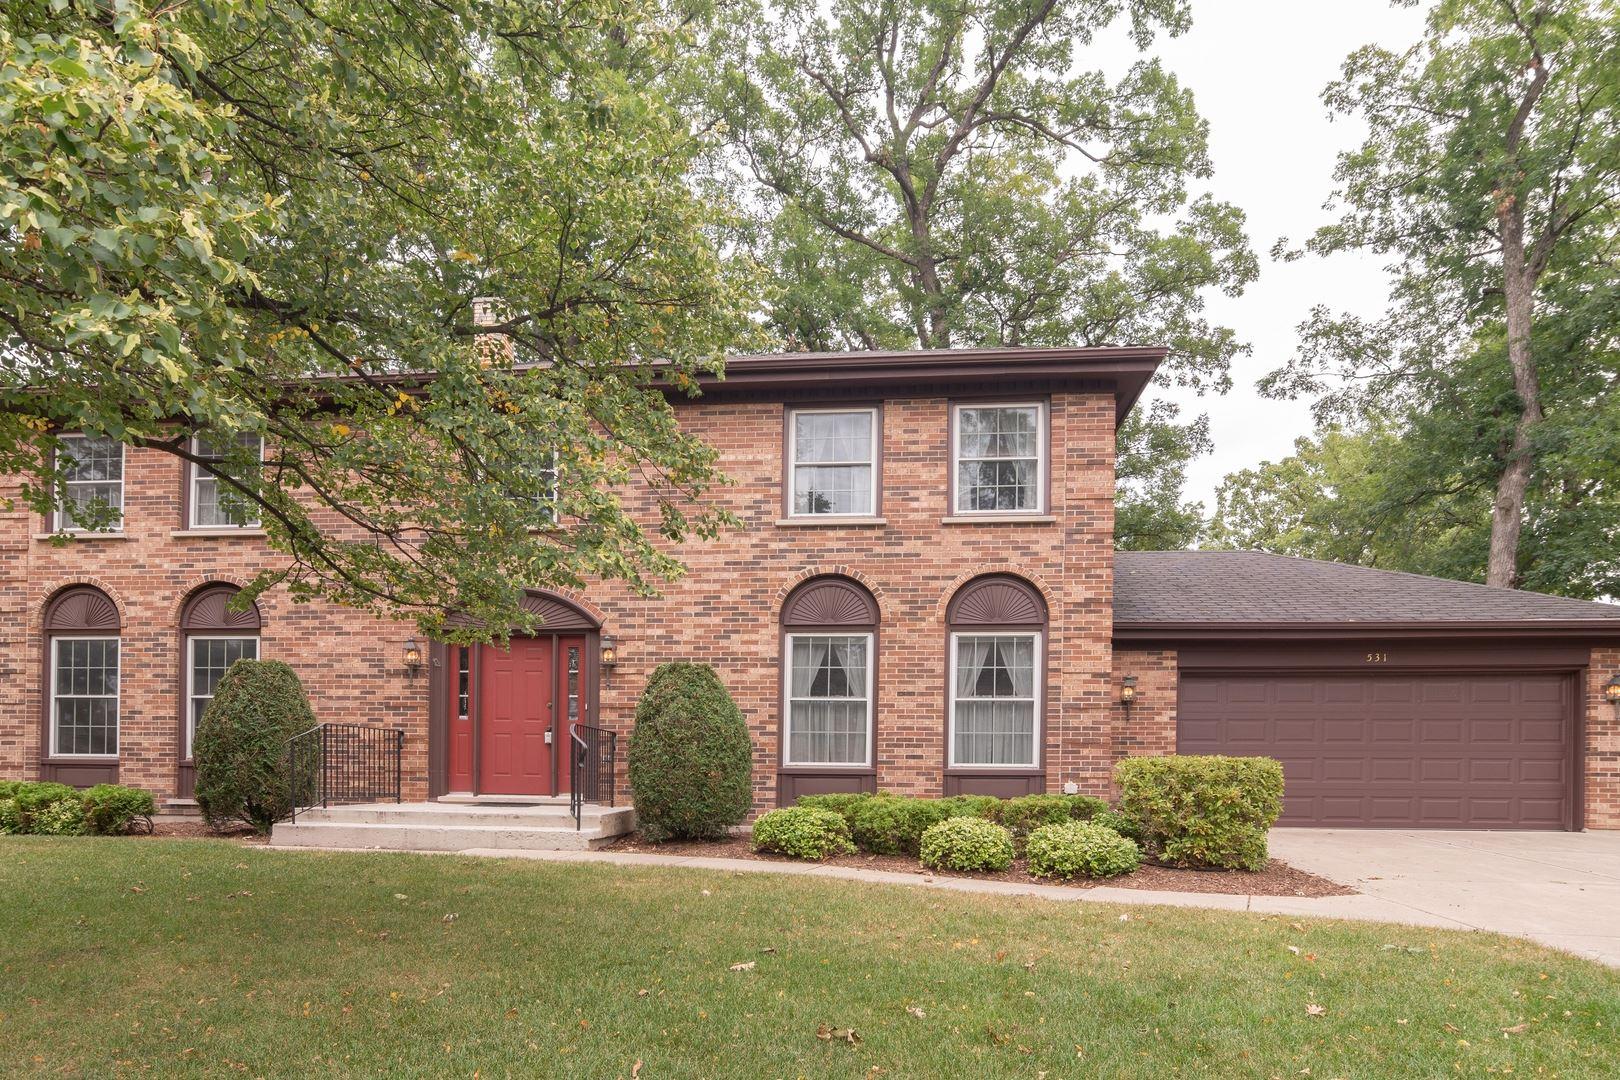 531 N Cardinal Avenue, Addison, IL 60101 - #: 10812788